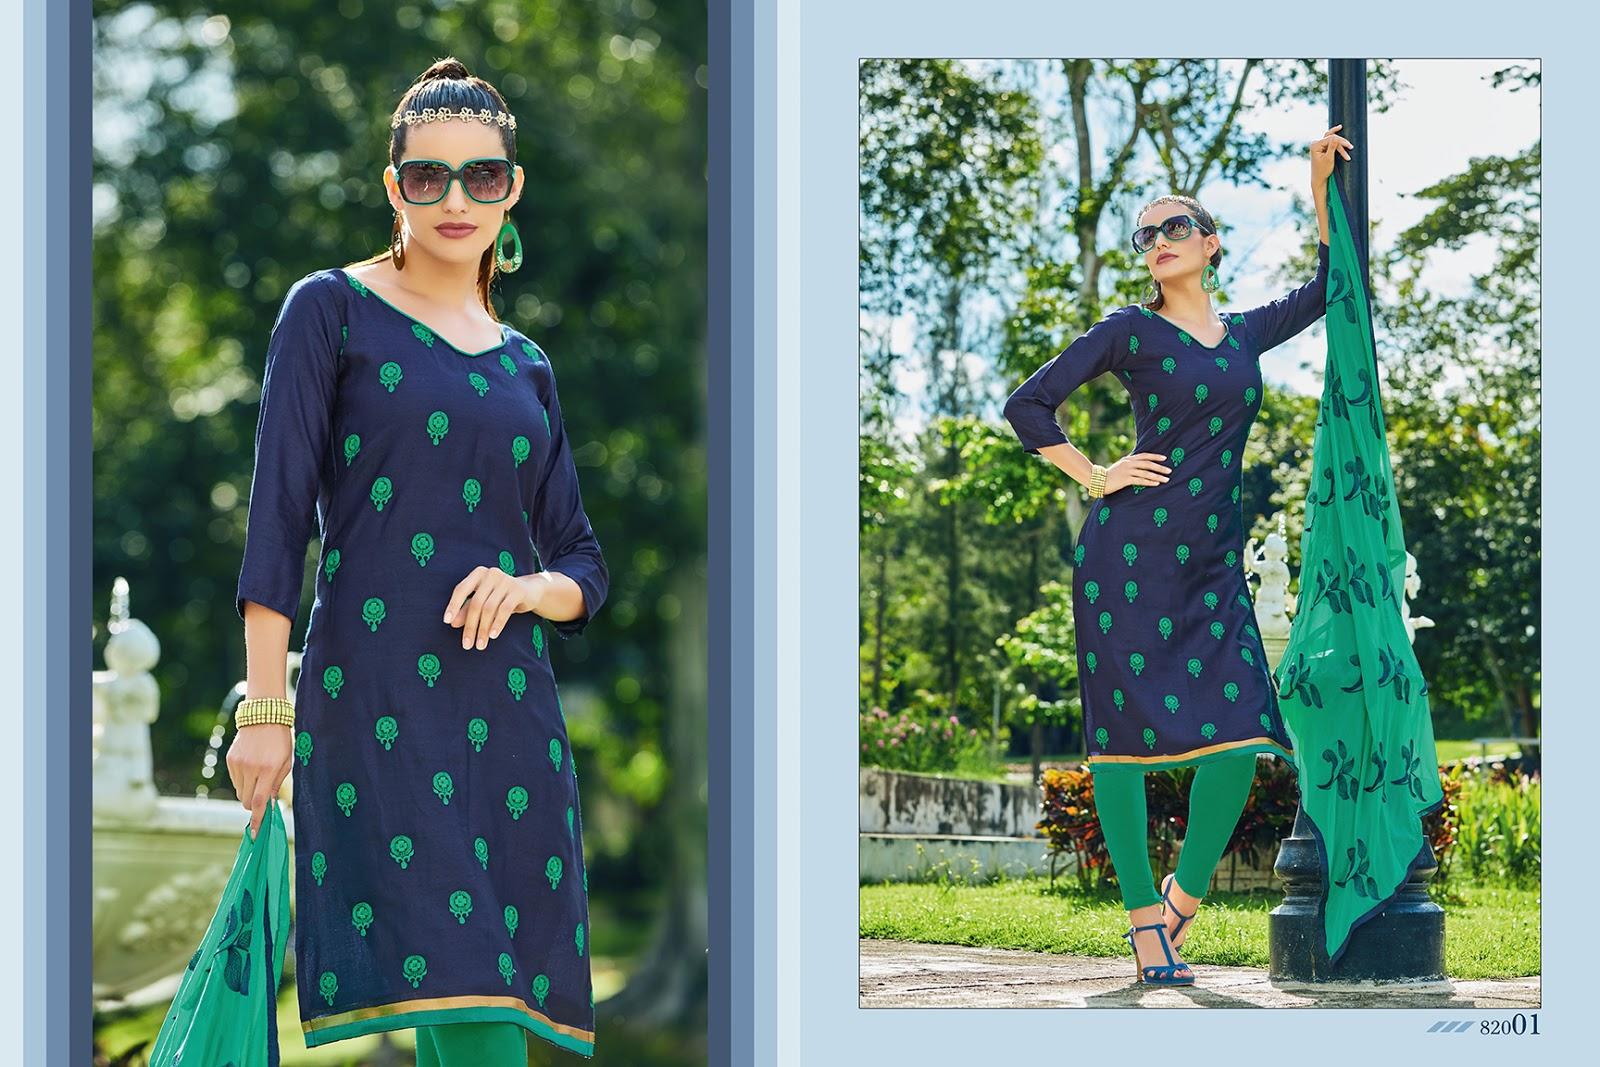 Kavvya-82(Currency)-New Arrival Mumbai Cotton Dress Material